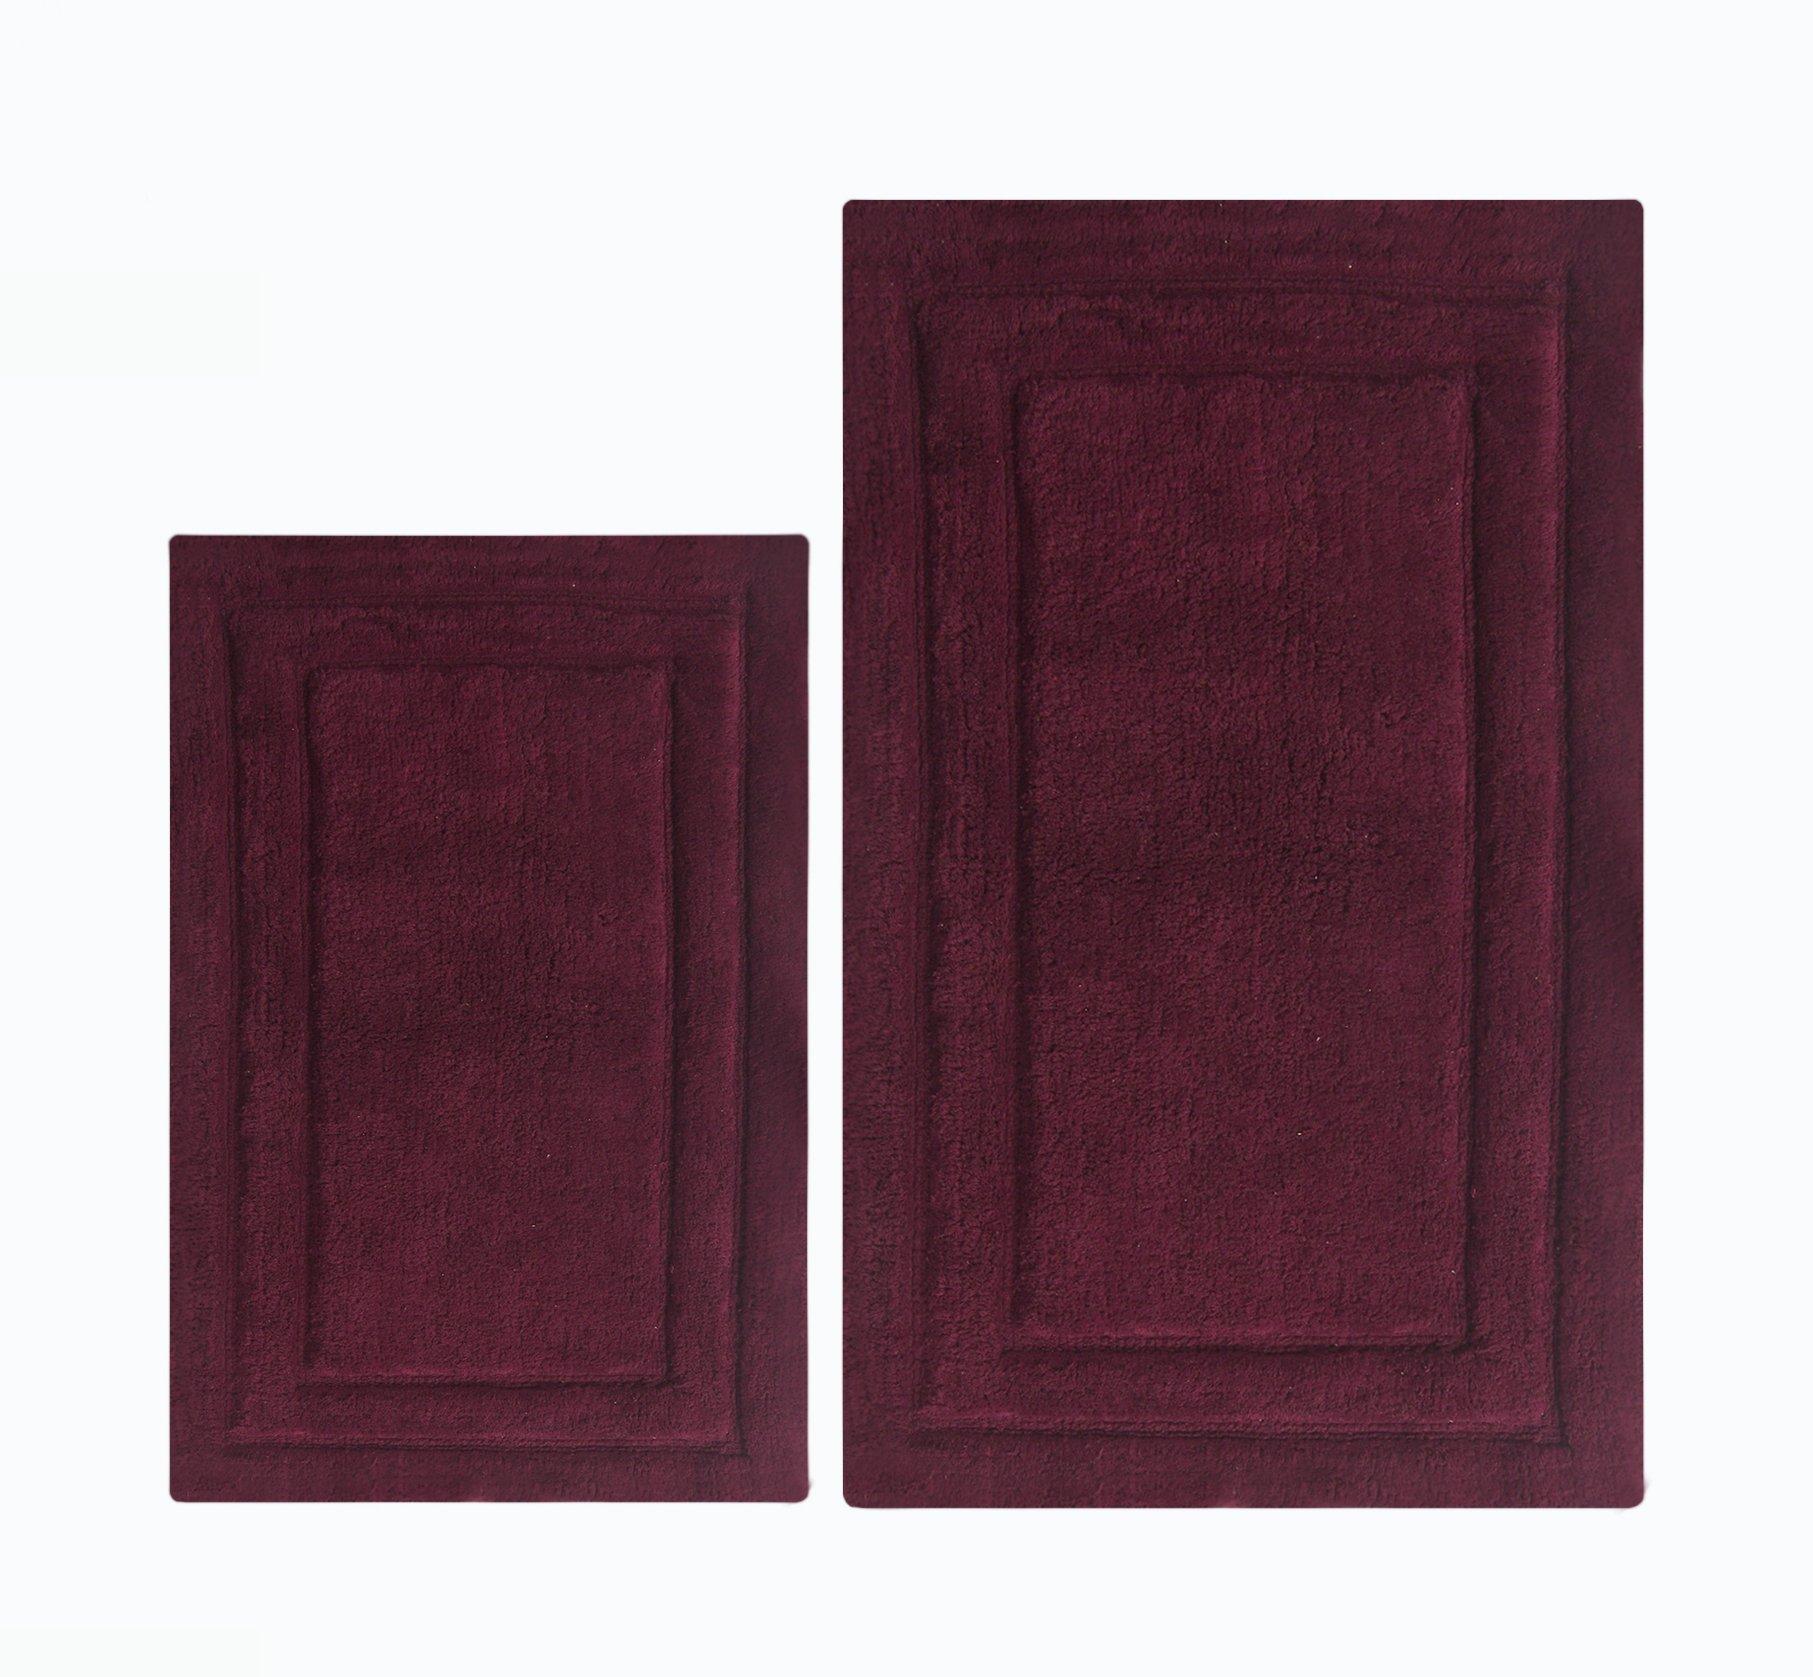 Chardin home - 100% Cotton two Piece Classic Bath Rug Set, (24''x40'' & 21''x34'') with anti-skid spray latex back, Burgundy